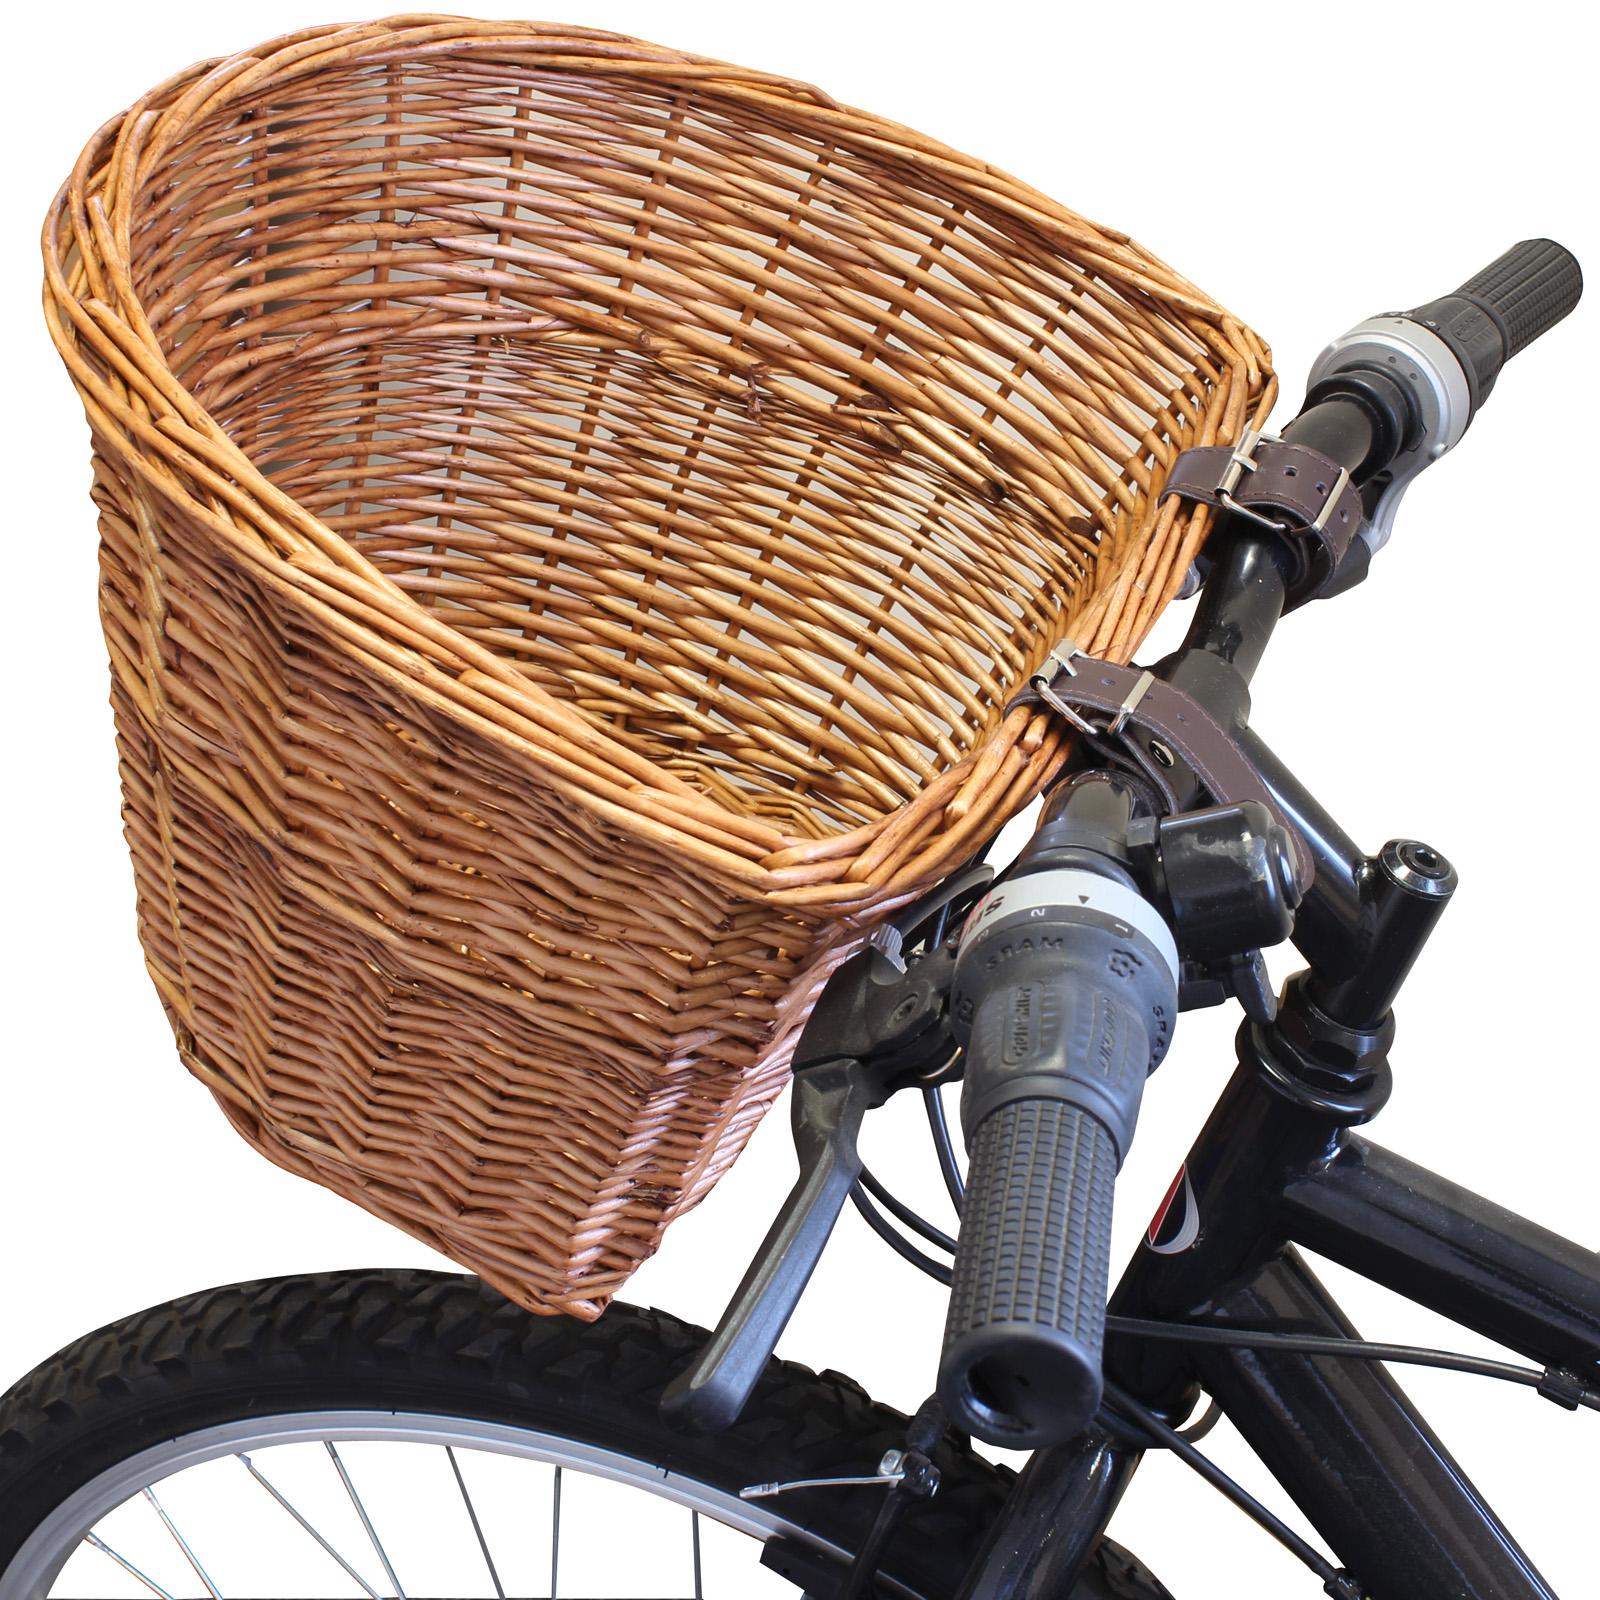 Practical Bike Basket Bicycle Cycle Front Bike Basket Shopping Holder Canvas